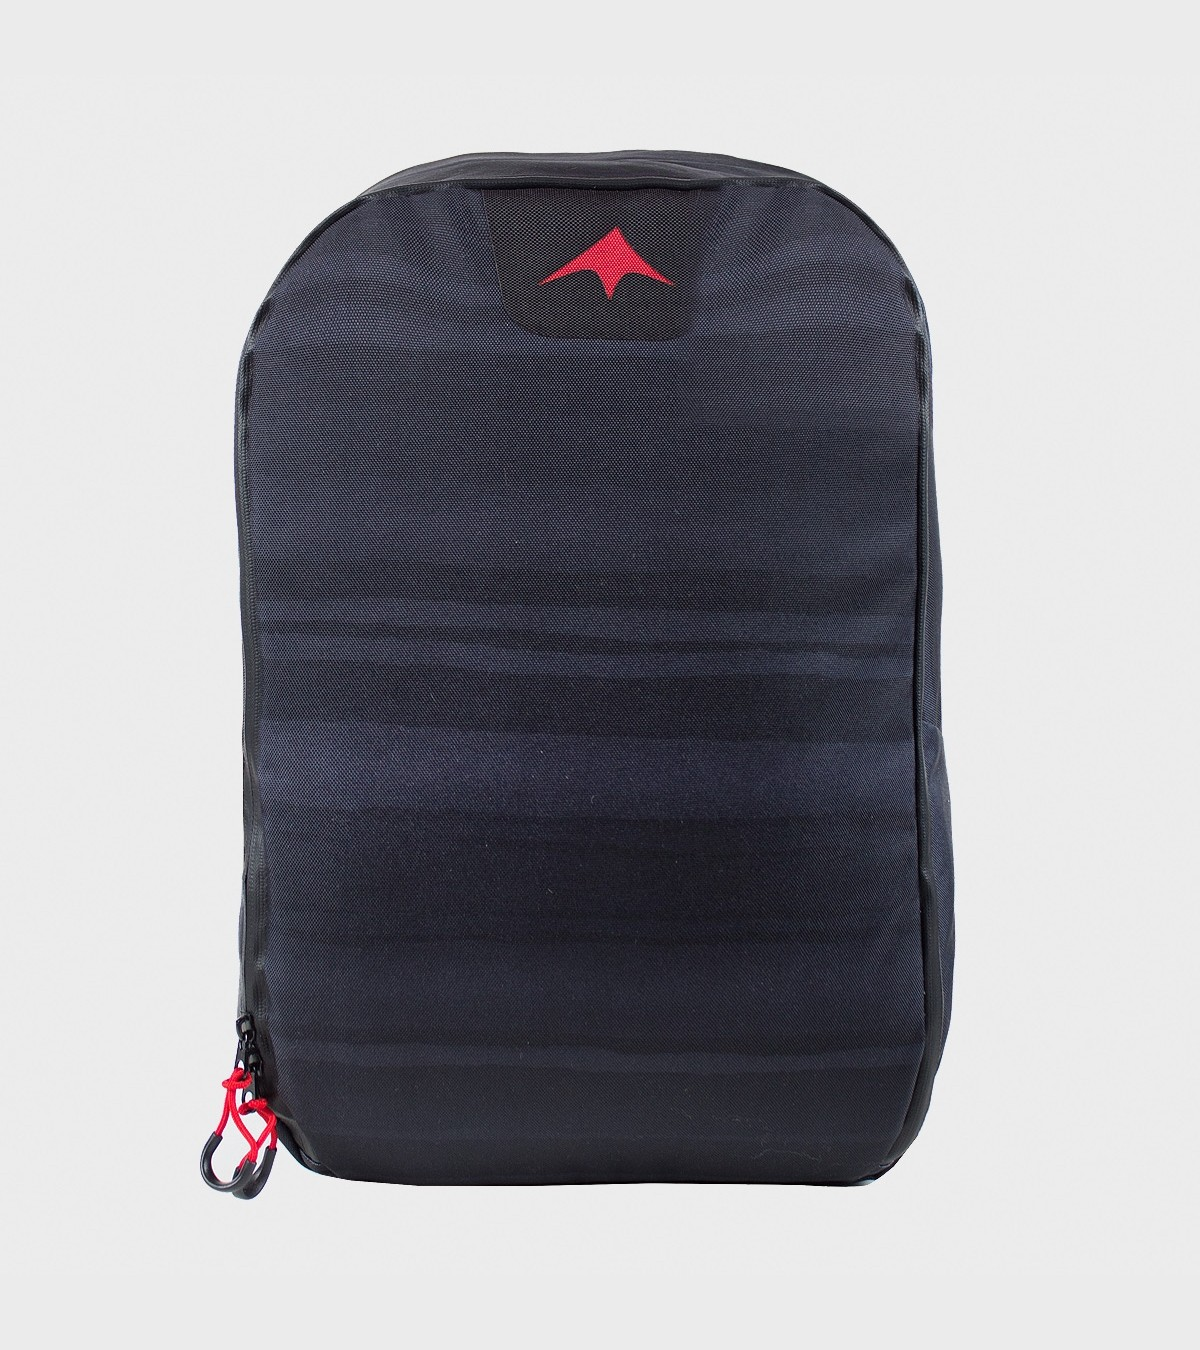 Mochila porta tablet Ram 21 Lts